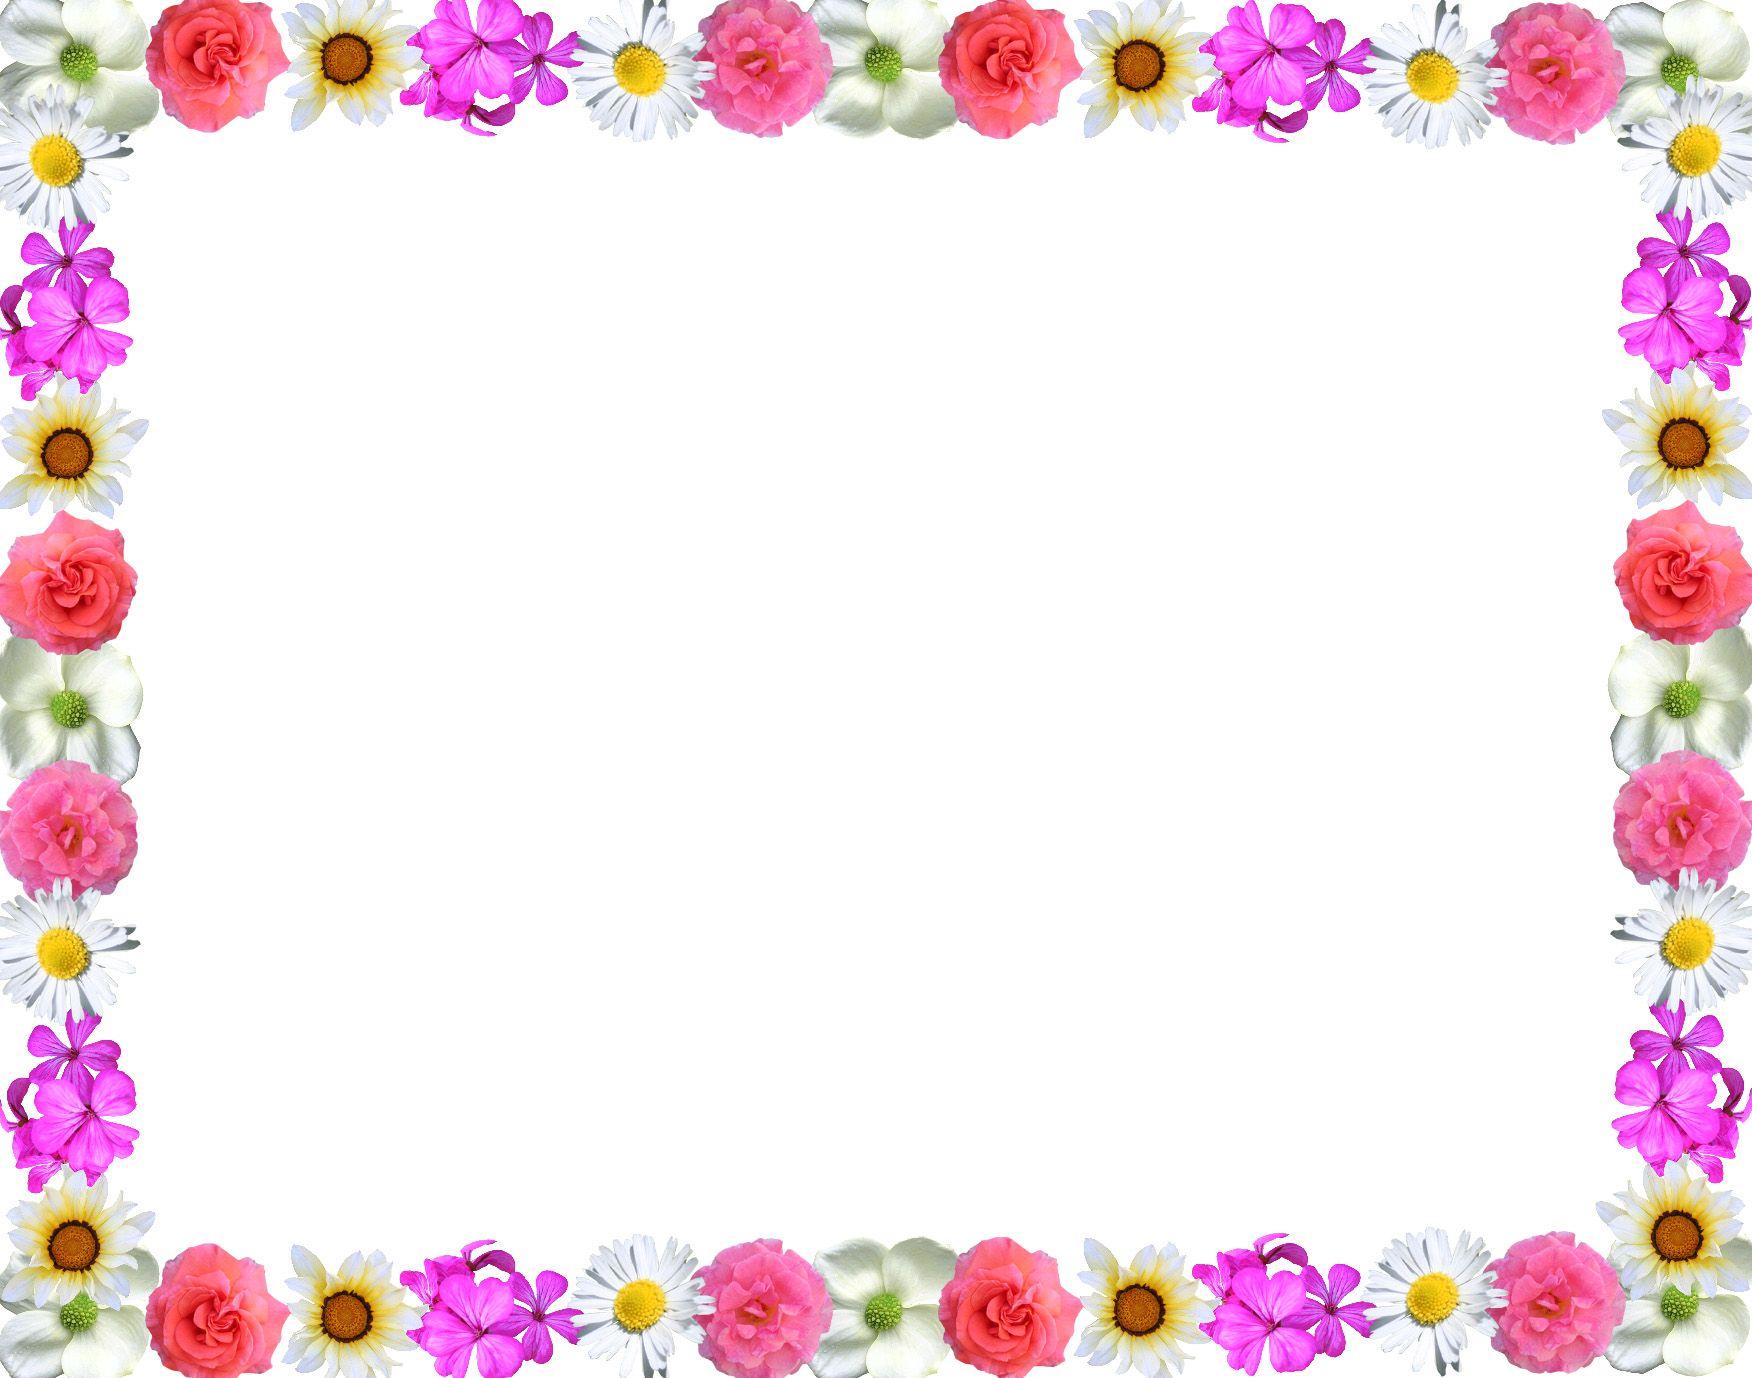 Pink purple and green flowers clipart border jpg free stock Stylish flowers Red purple Green Border Design HD 2016 ... jpg free stock